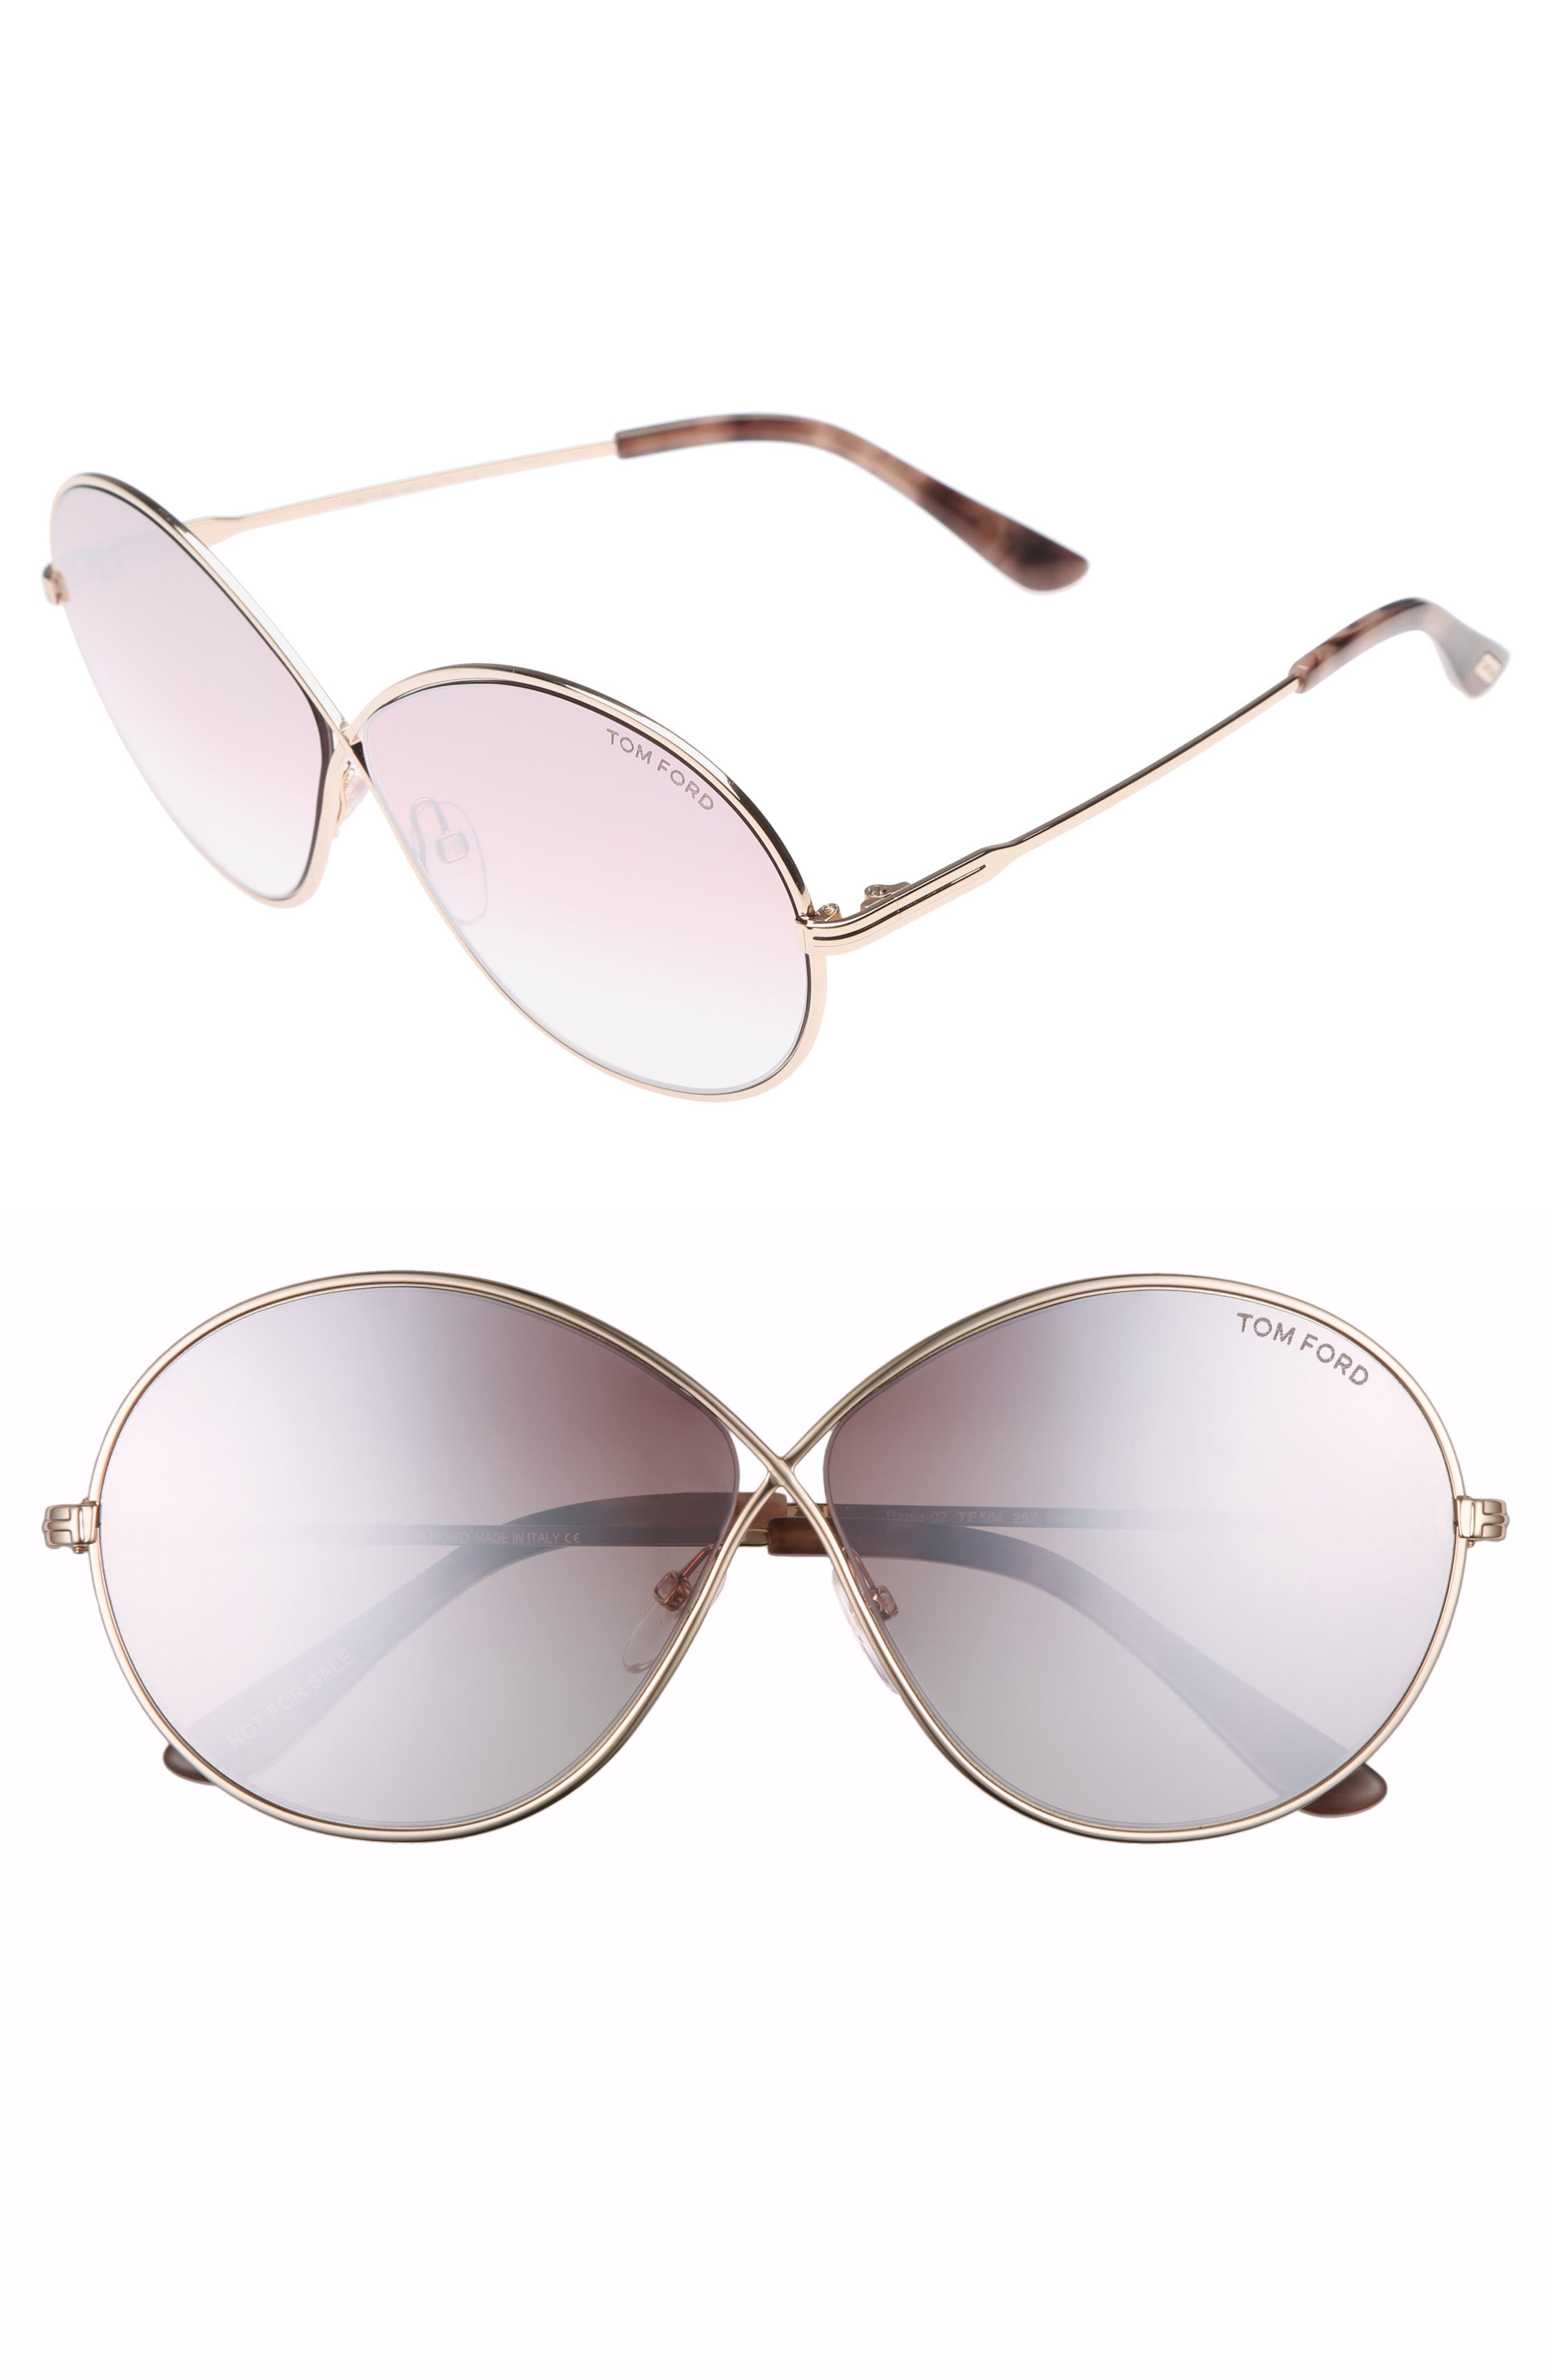 Rania 64mm Oversize Round Sunglasses,                         Main,                         color, Rose Gold/ Gradient Violet